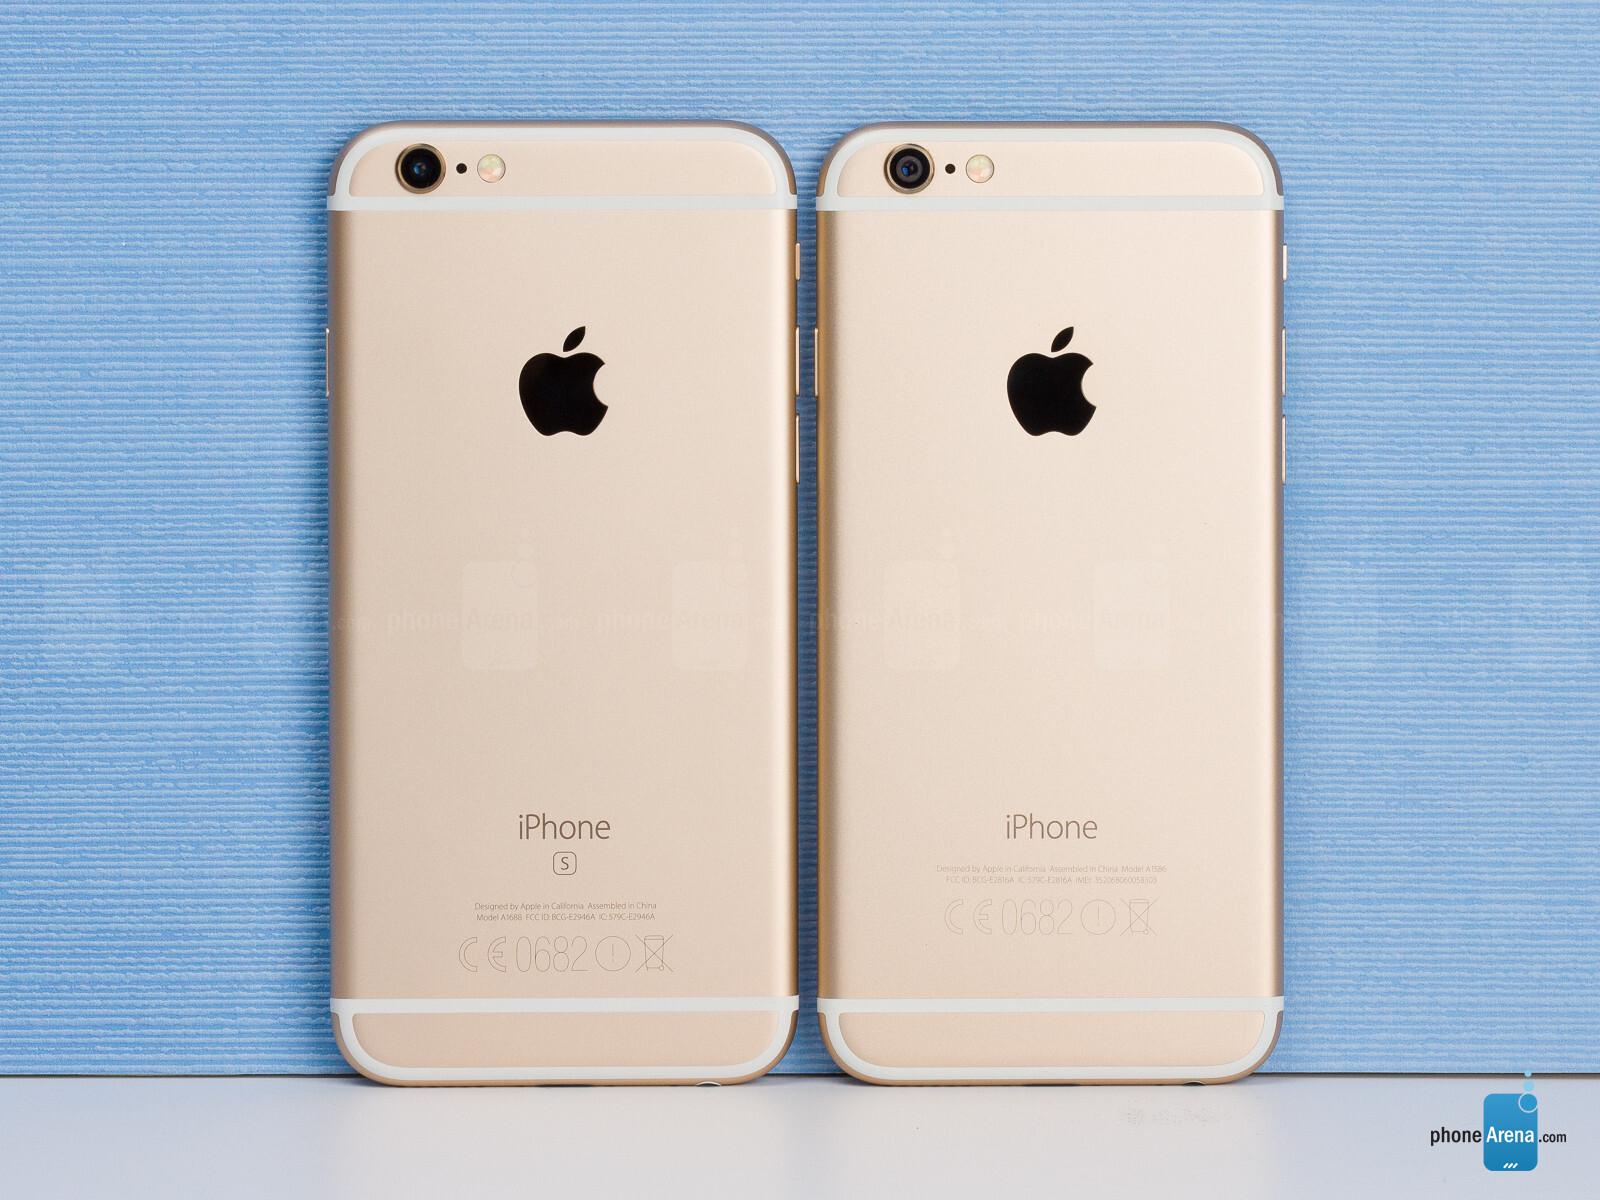 apple iphone 6s vs iphone 6 true last communication. Black Bedroom Furniture Sets. Home Design Ideas